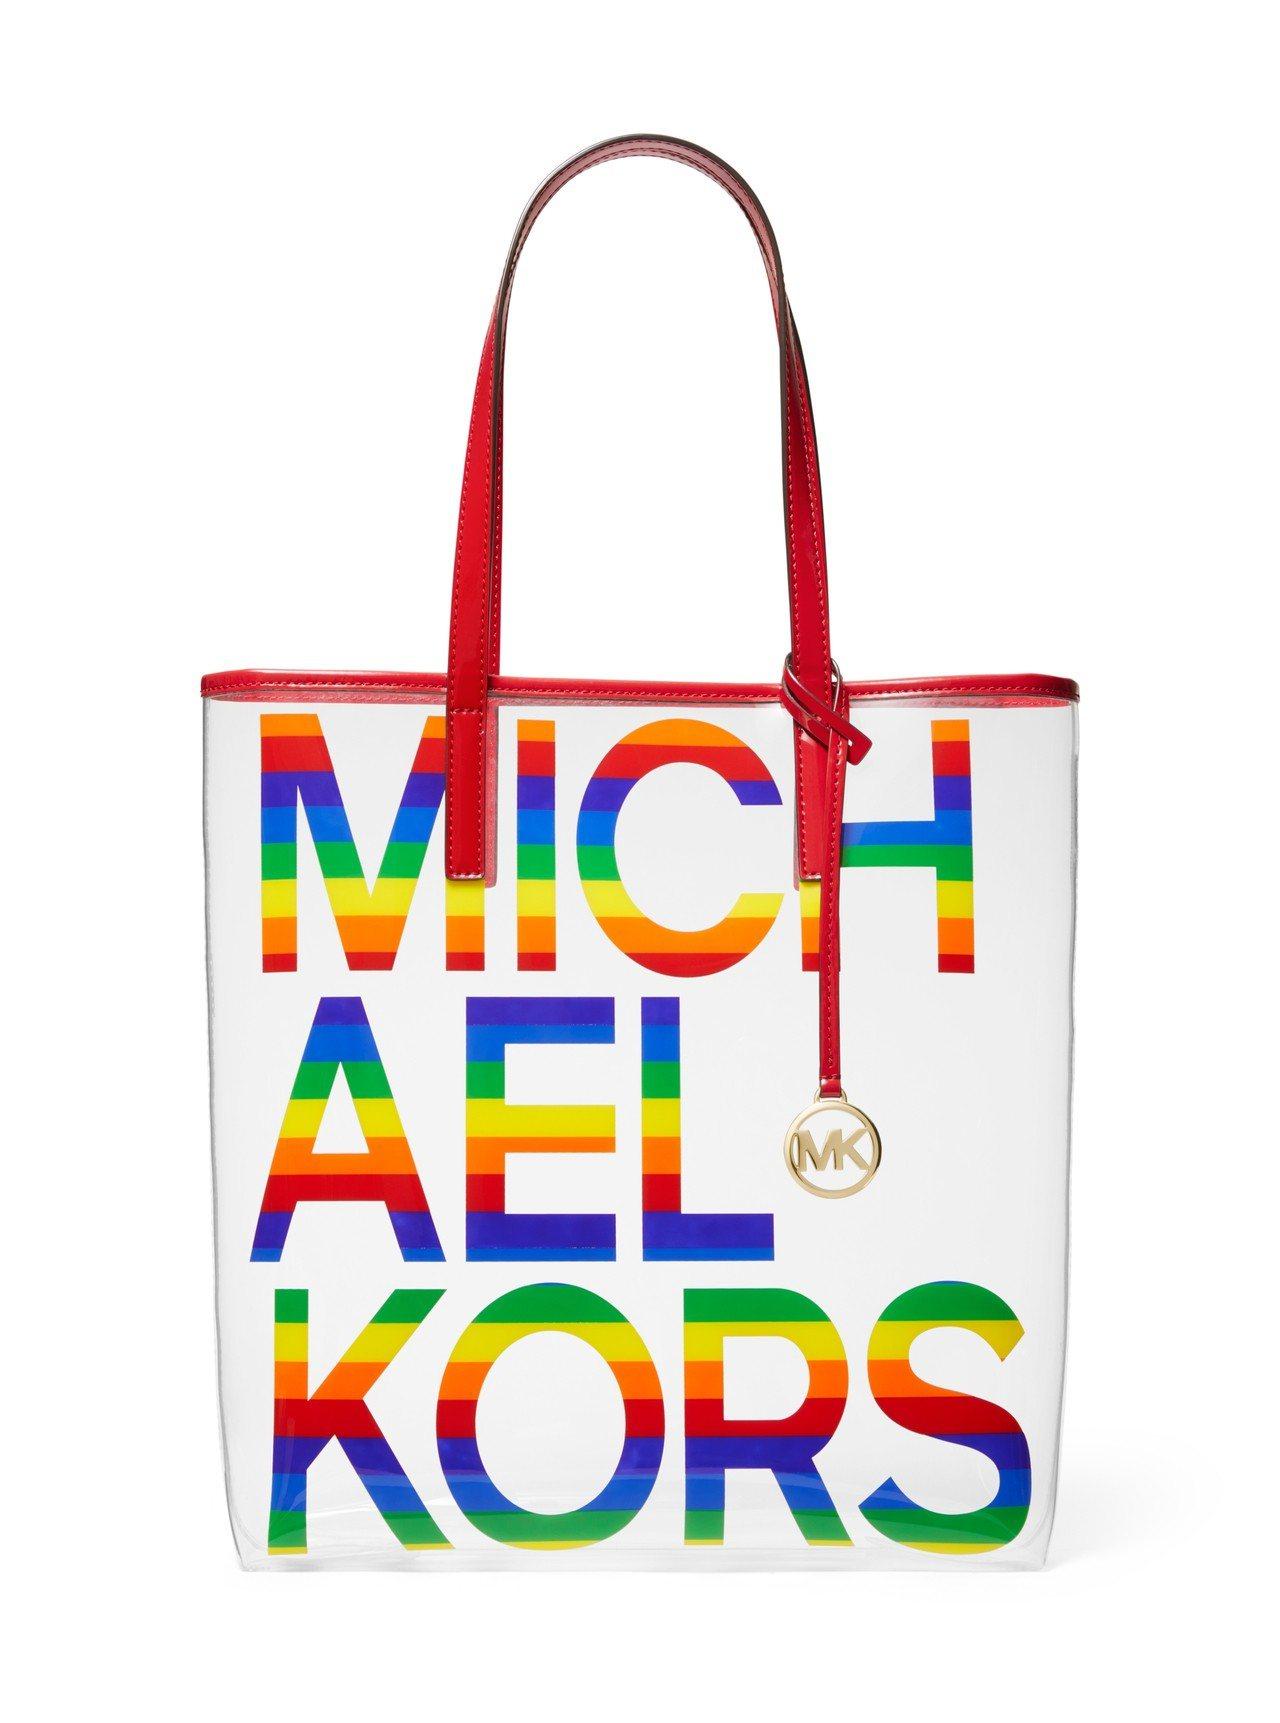 MMK彩虹系列透明托特包,售價7,000元。圖/MICHAEL KORS提供